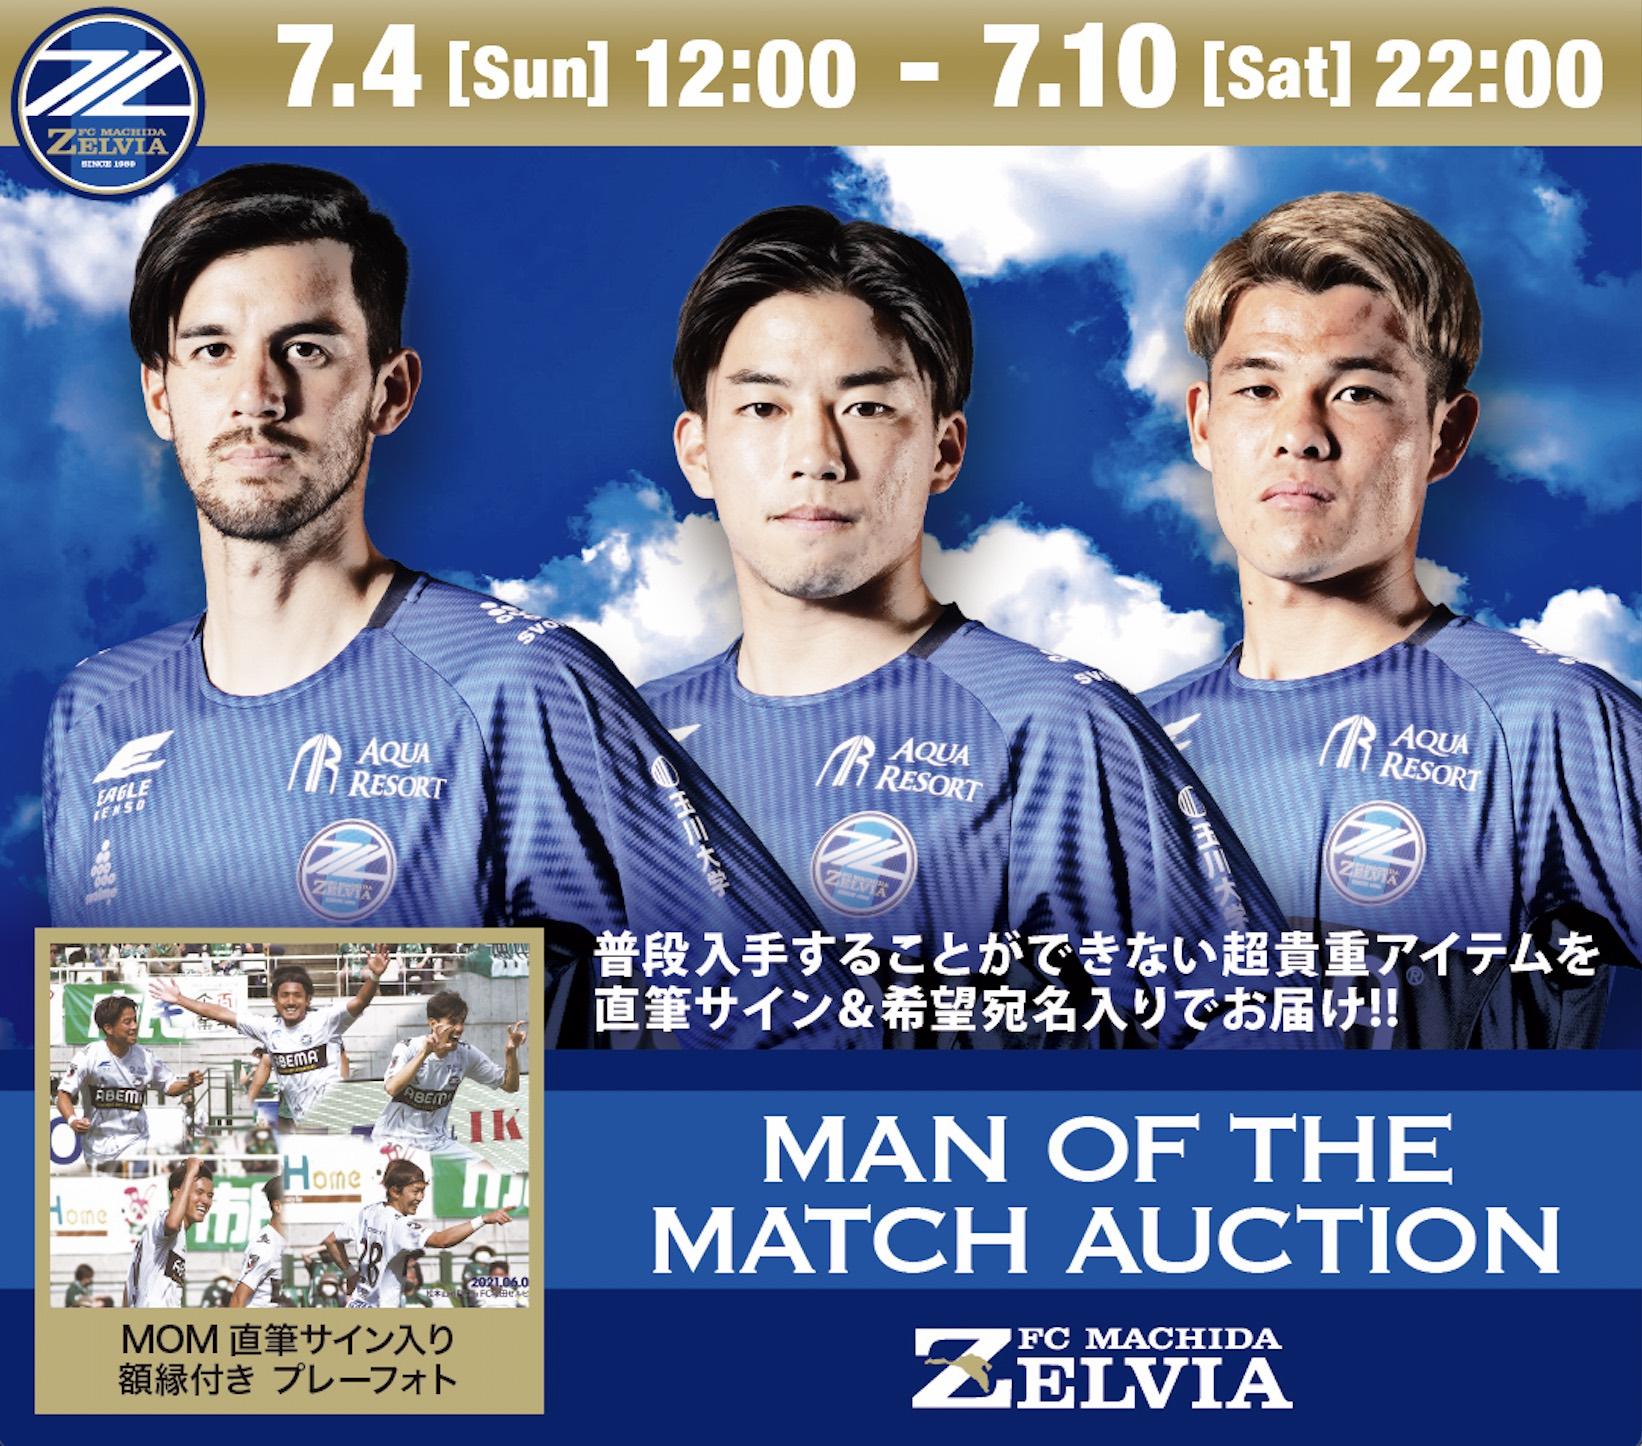 FC町田ゼルビア「マン・オブ・ザ・マッチ」オークション(7月)